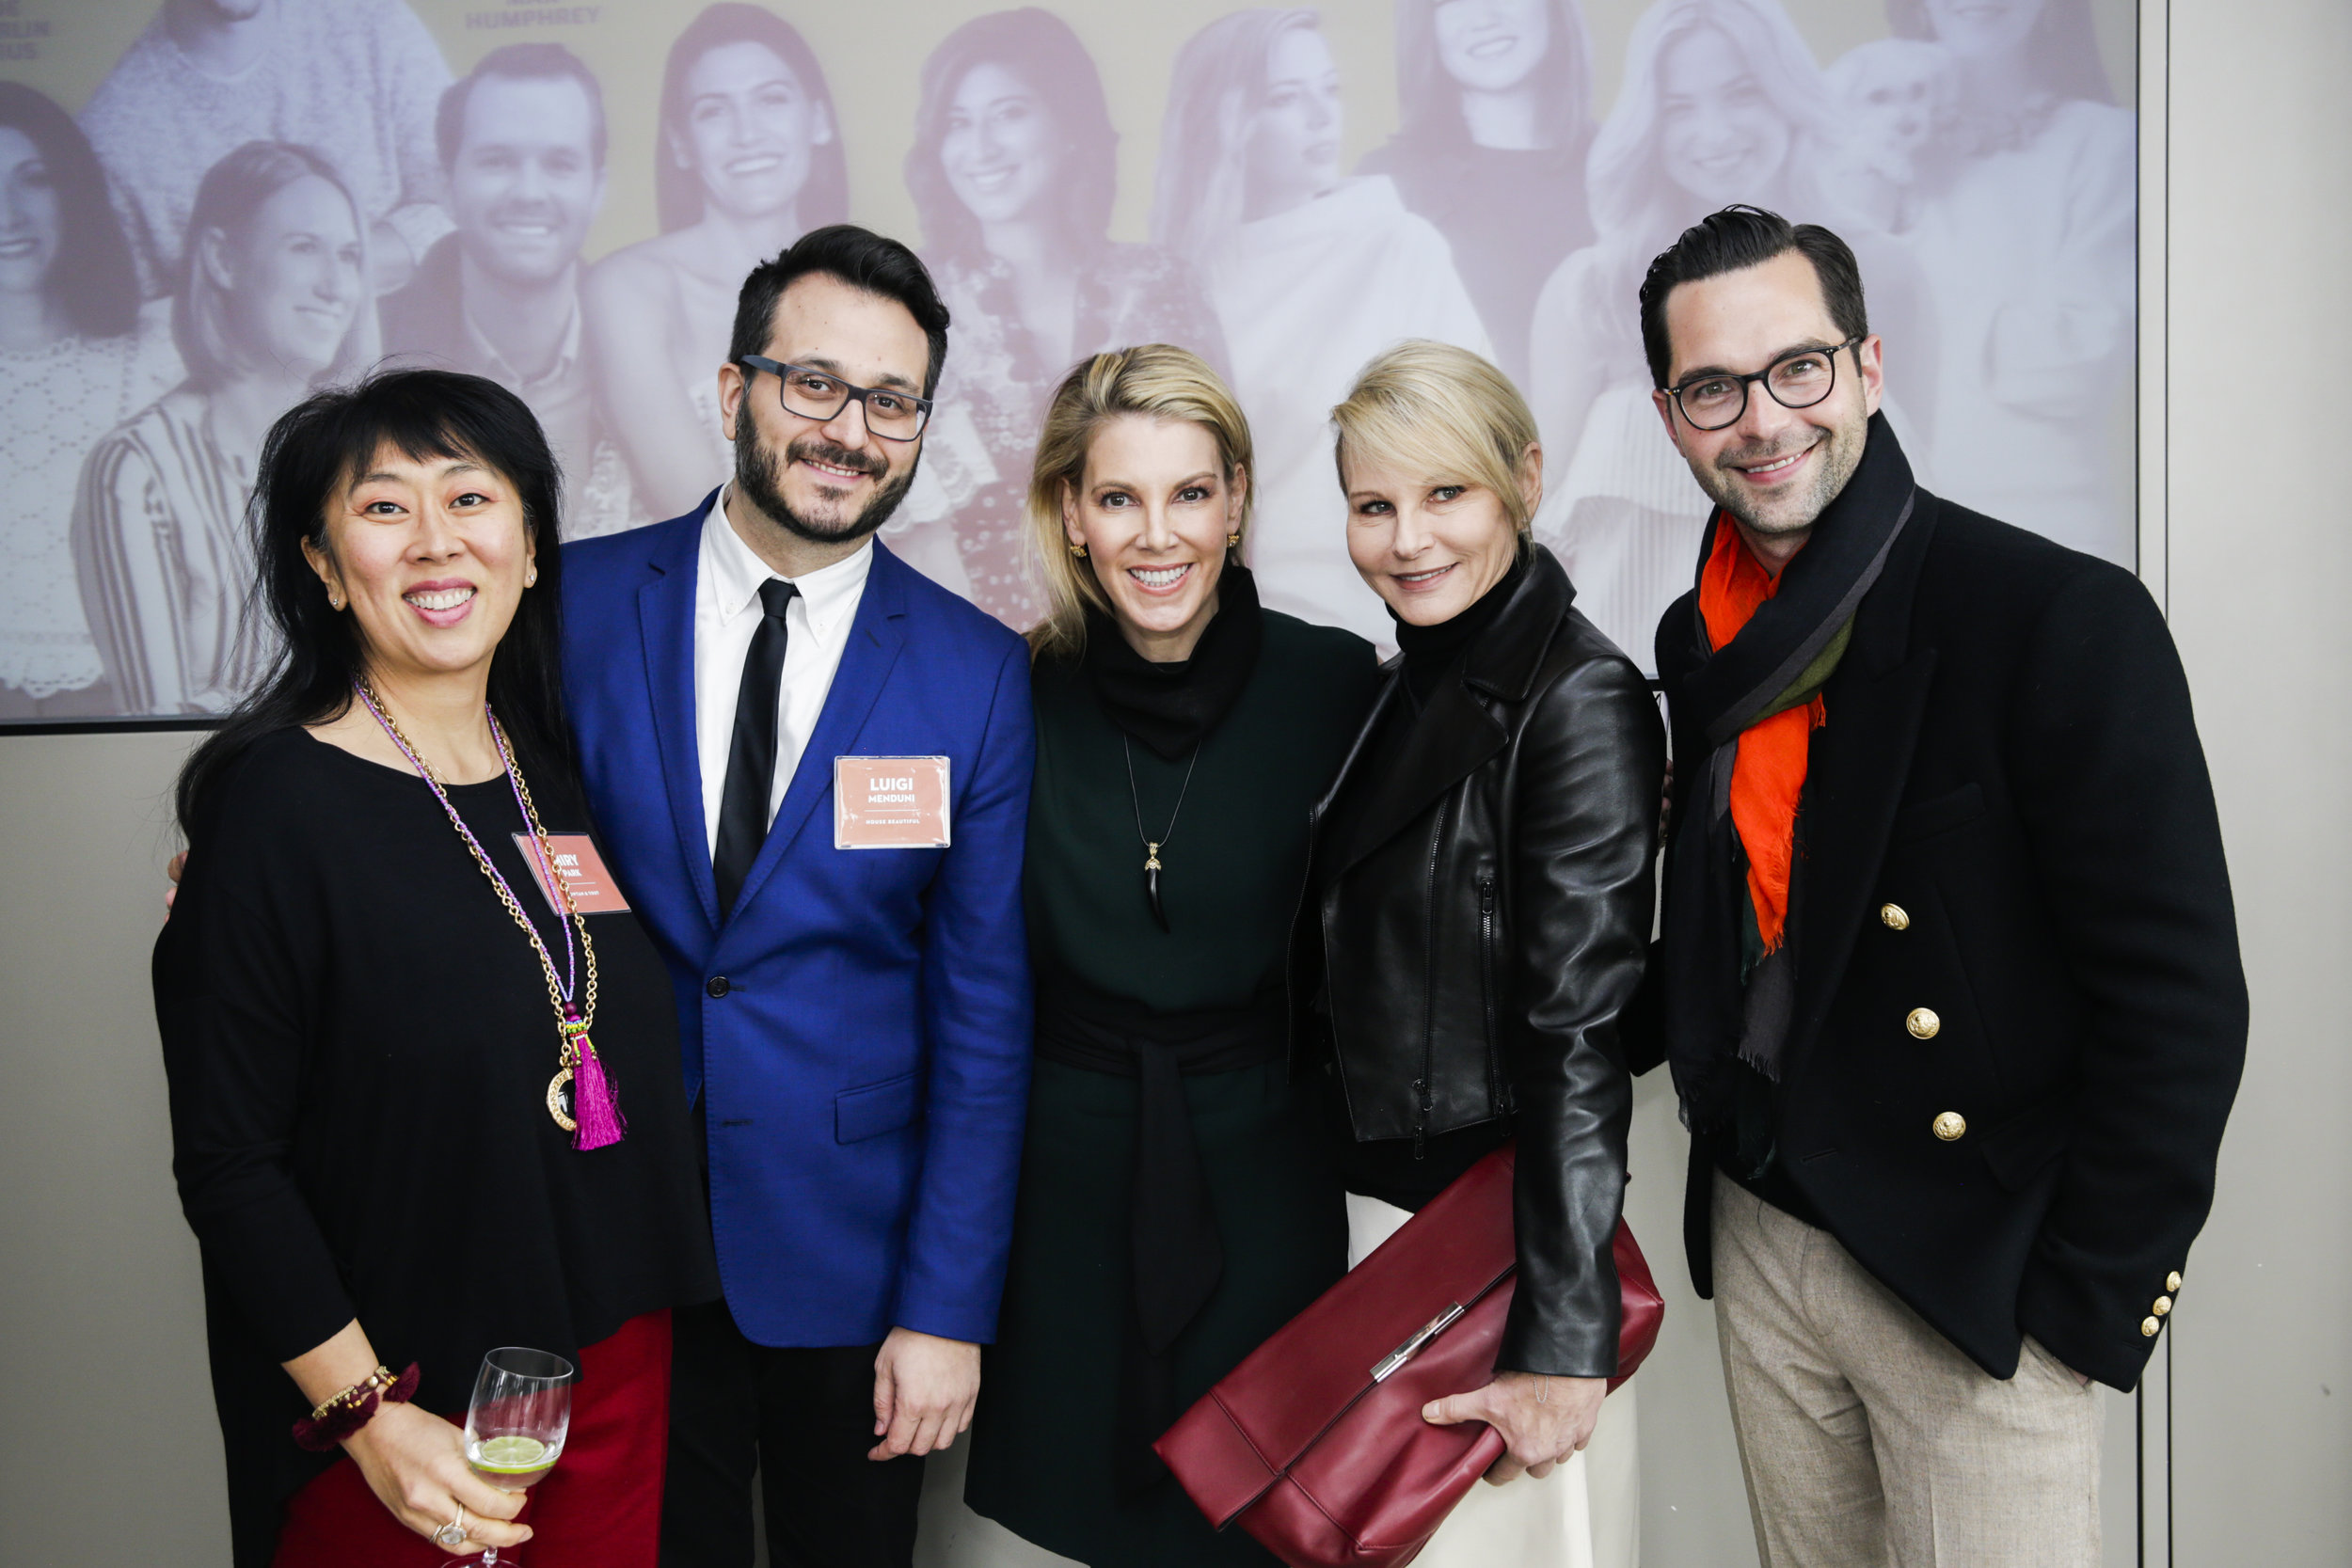 Miry Park, Luigi Menduni, Karen Marx, Key Hall, Bennett Leiffer